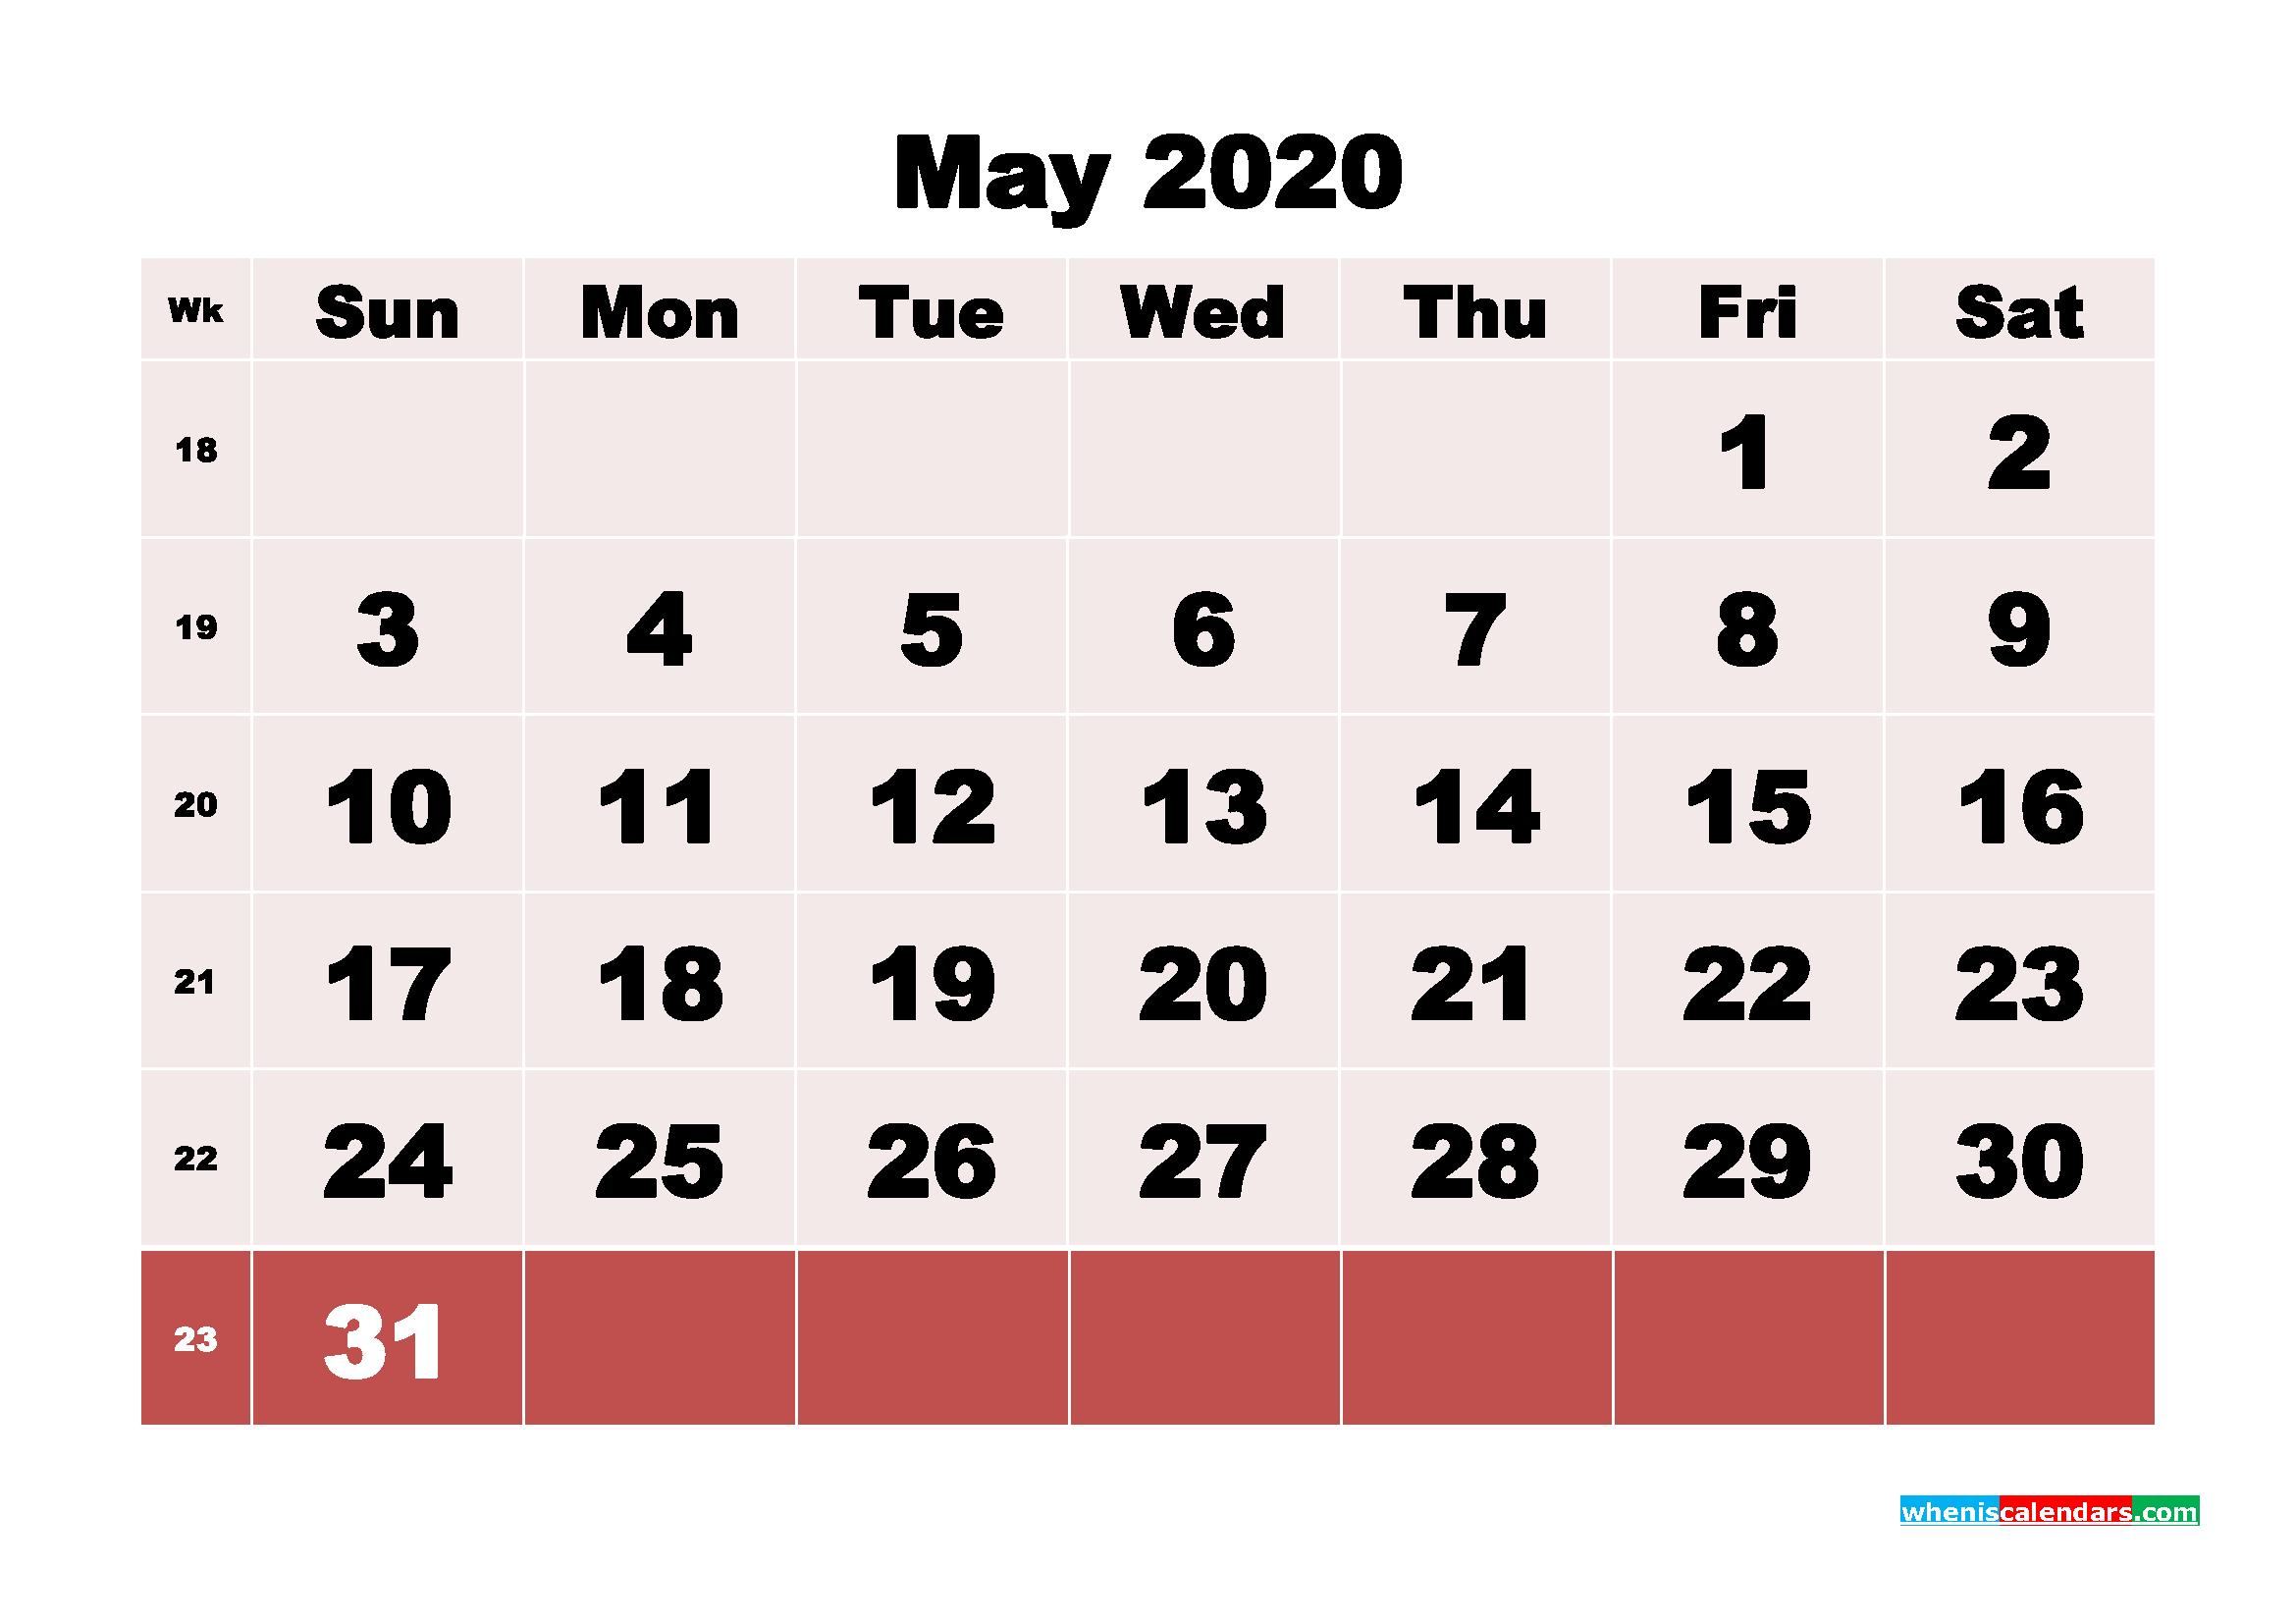 Free Printable May 2020 Calendar - No.m20b101